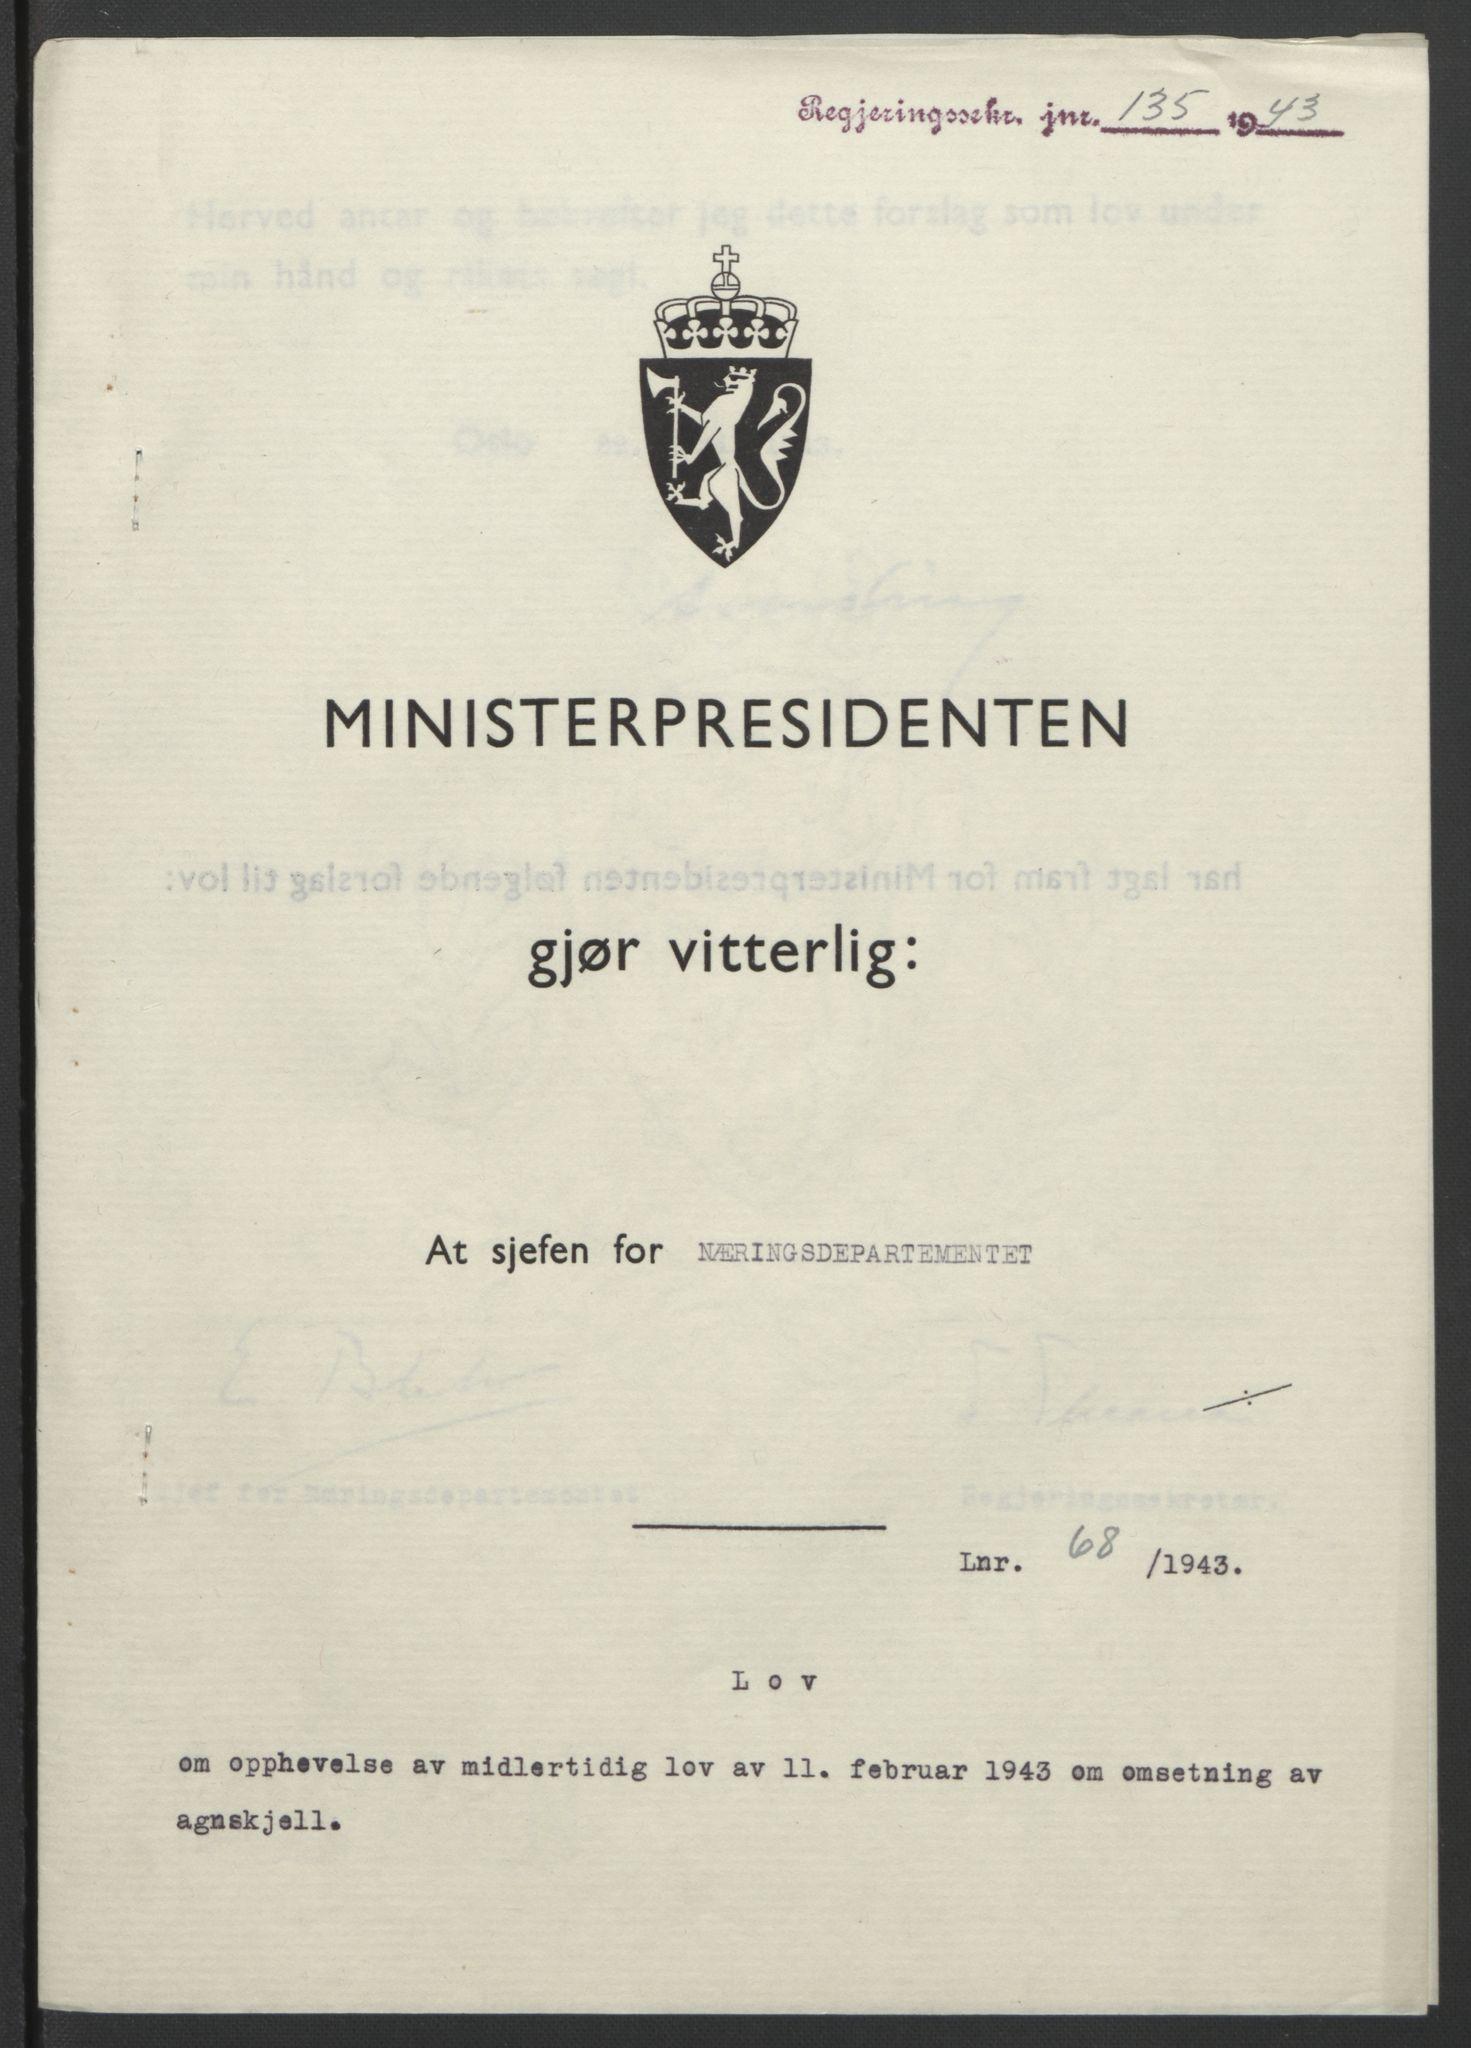 RA, NS-administrasjonen 1940-1945 (Statsrådsekretariatet, de kommisariske statsråder mm), D/Db/L0099: Lover, 1943, s. 312